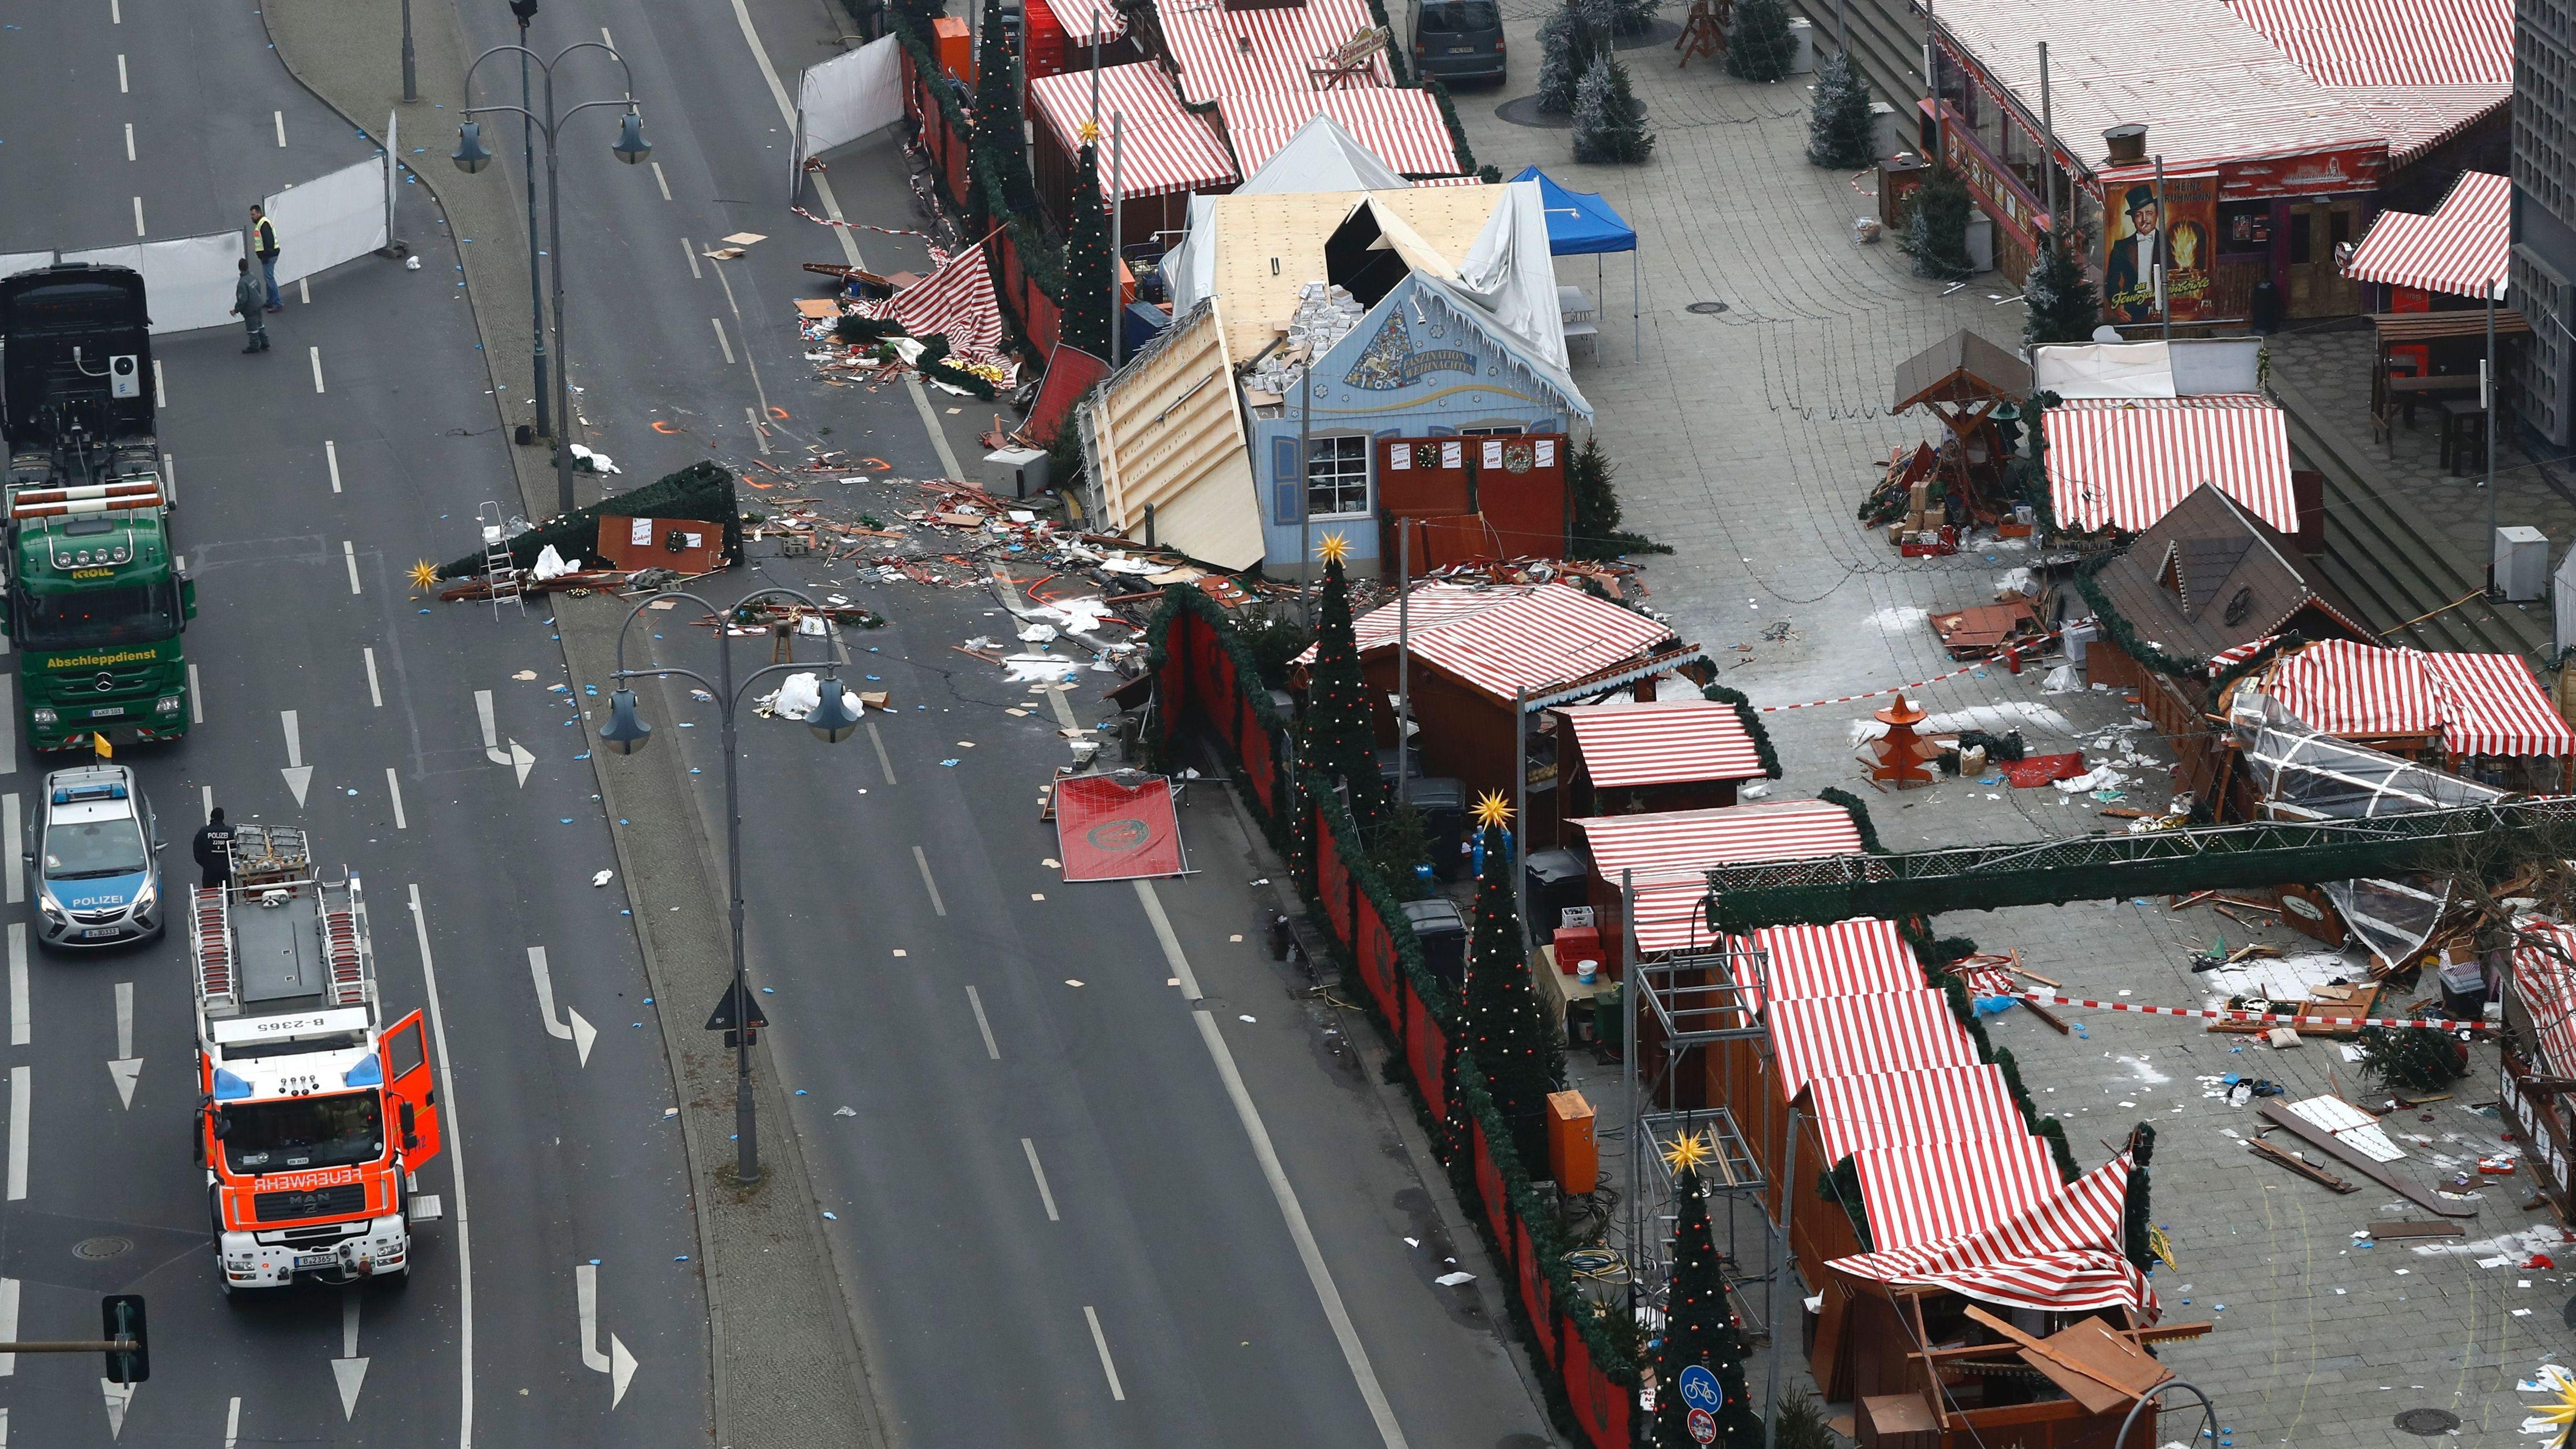 Man Arrested Following Berlin Truck Attack Is Released